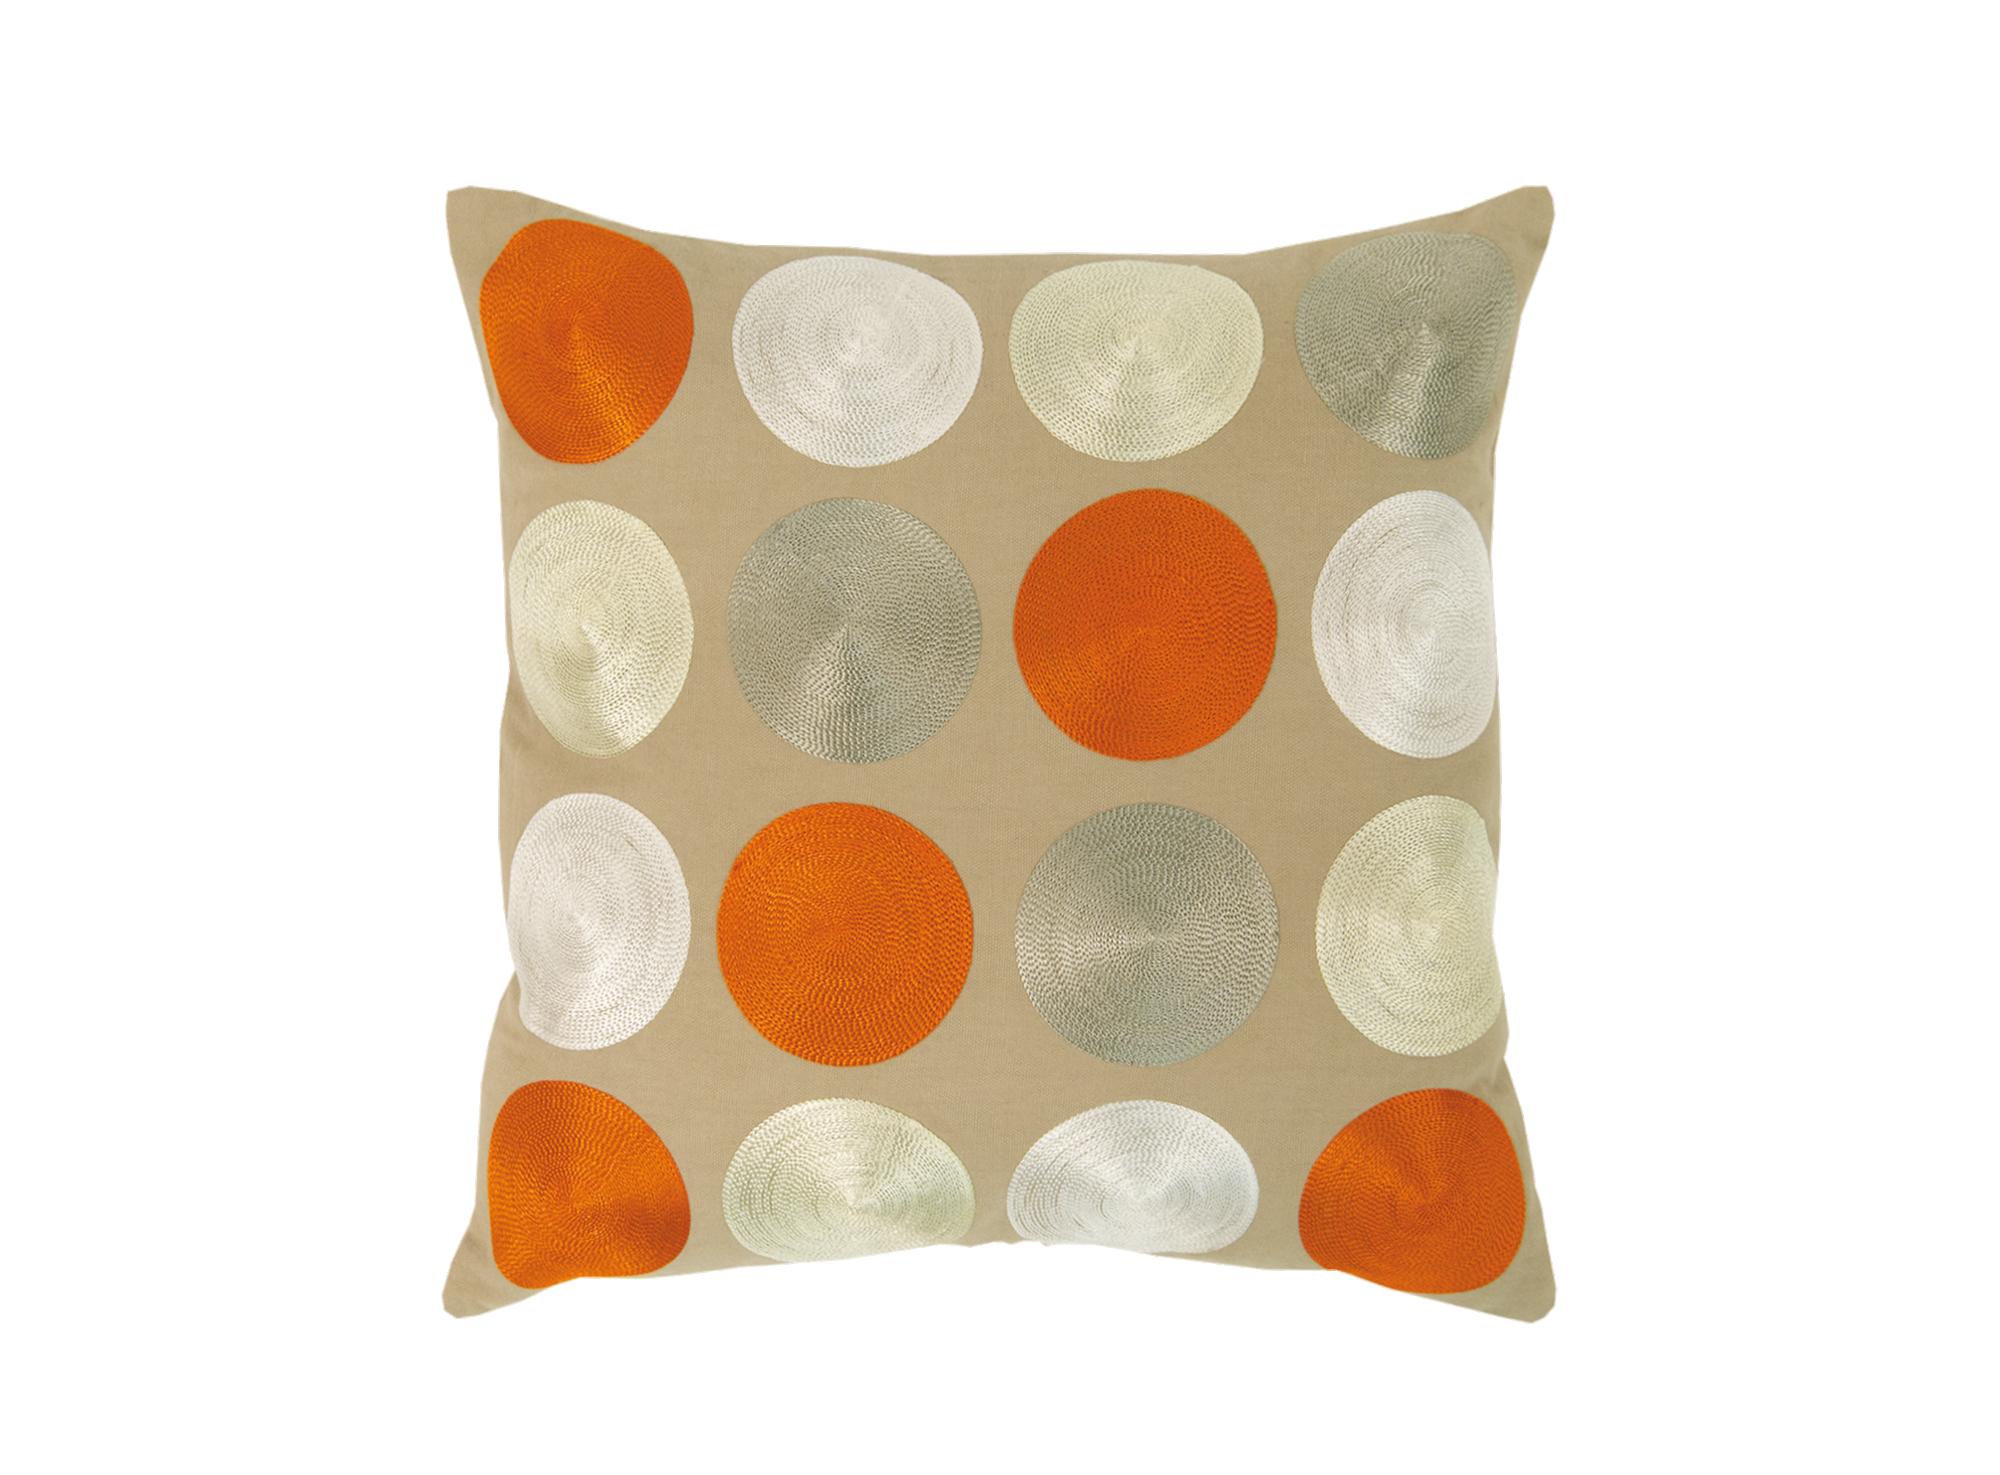 Coussin 40x40 revetu 100% coton garni 100% polyester coloris orange ...